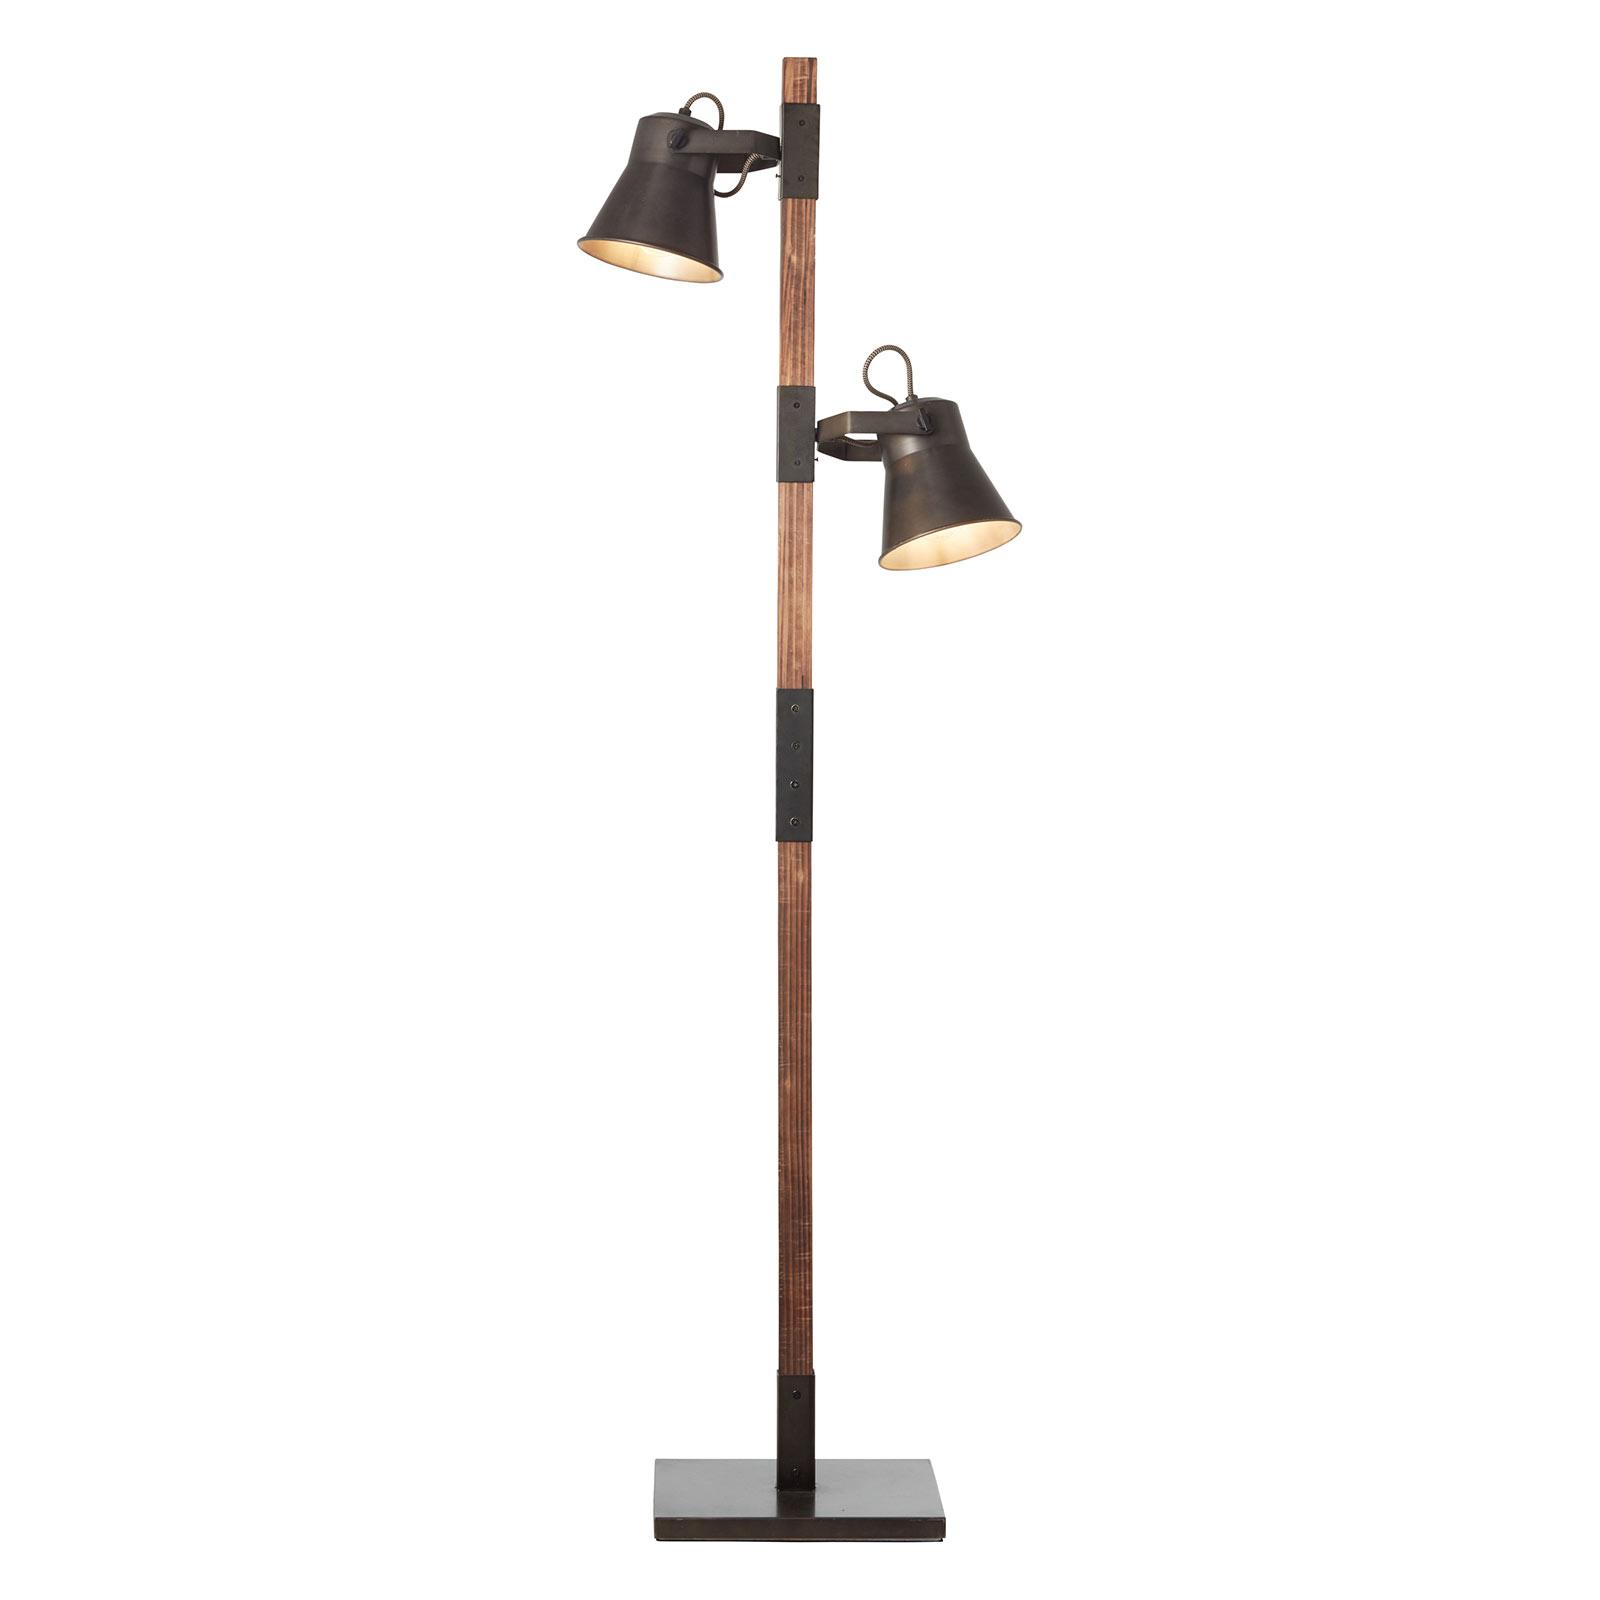 Vloerlamp Plow met 2 spots, zwart/hout donker